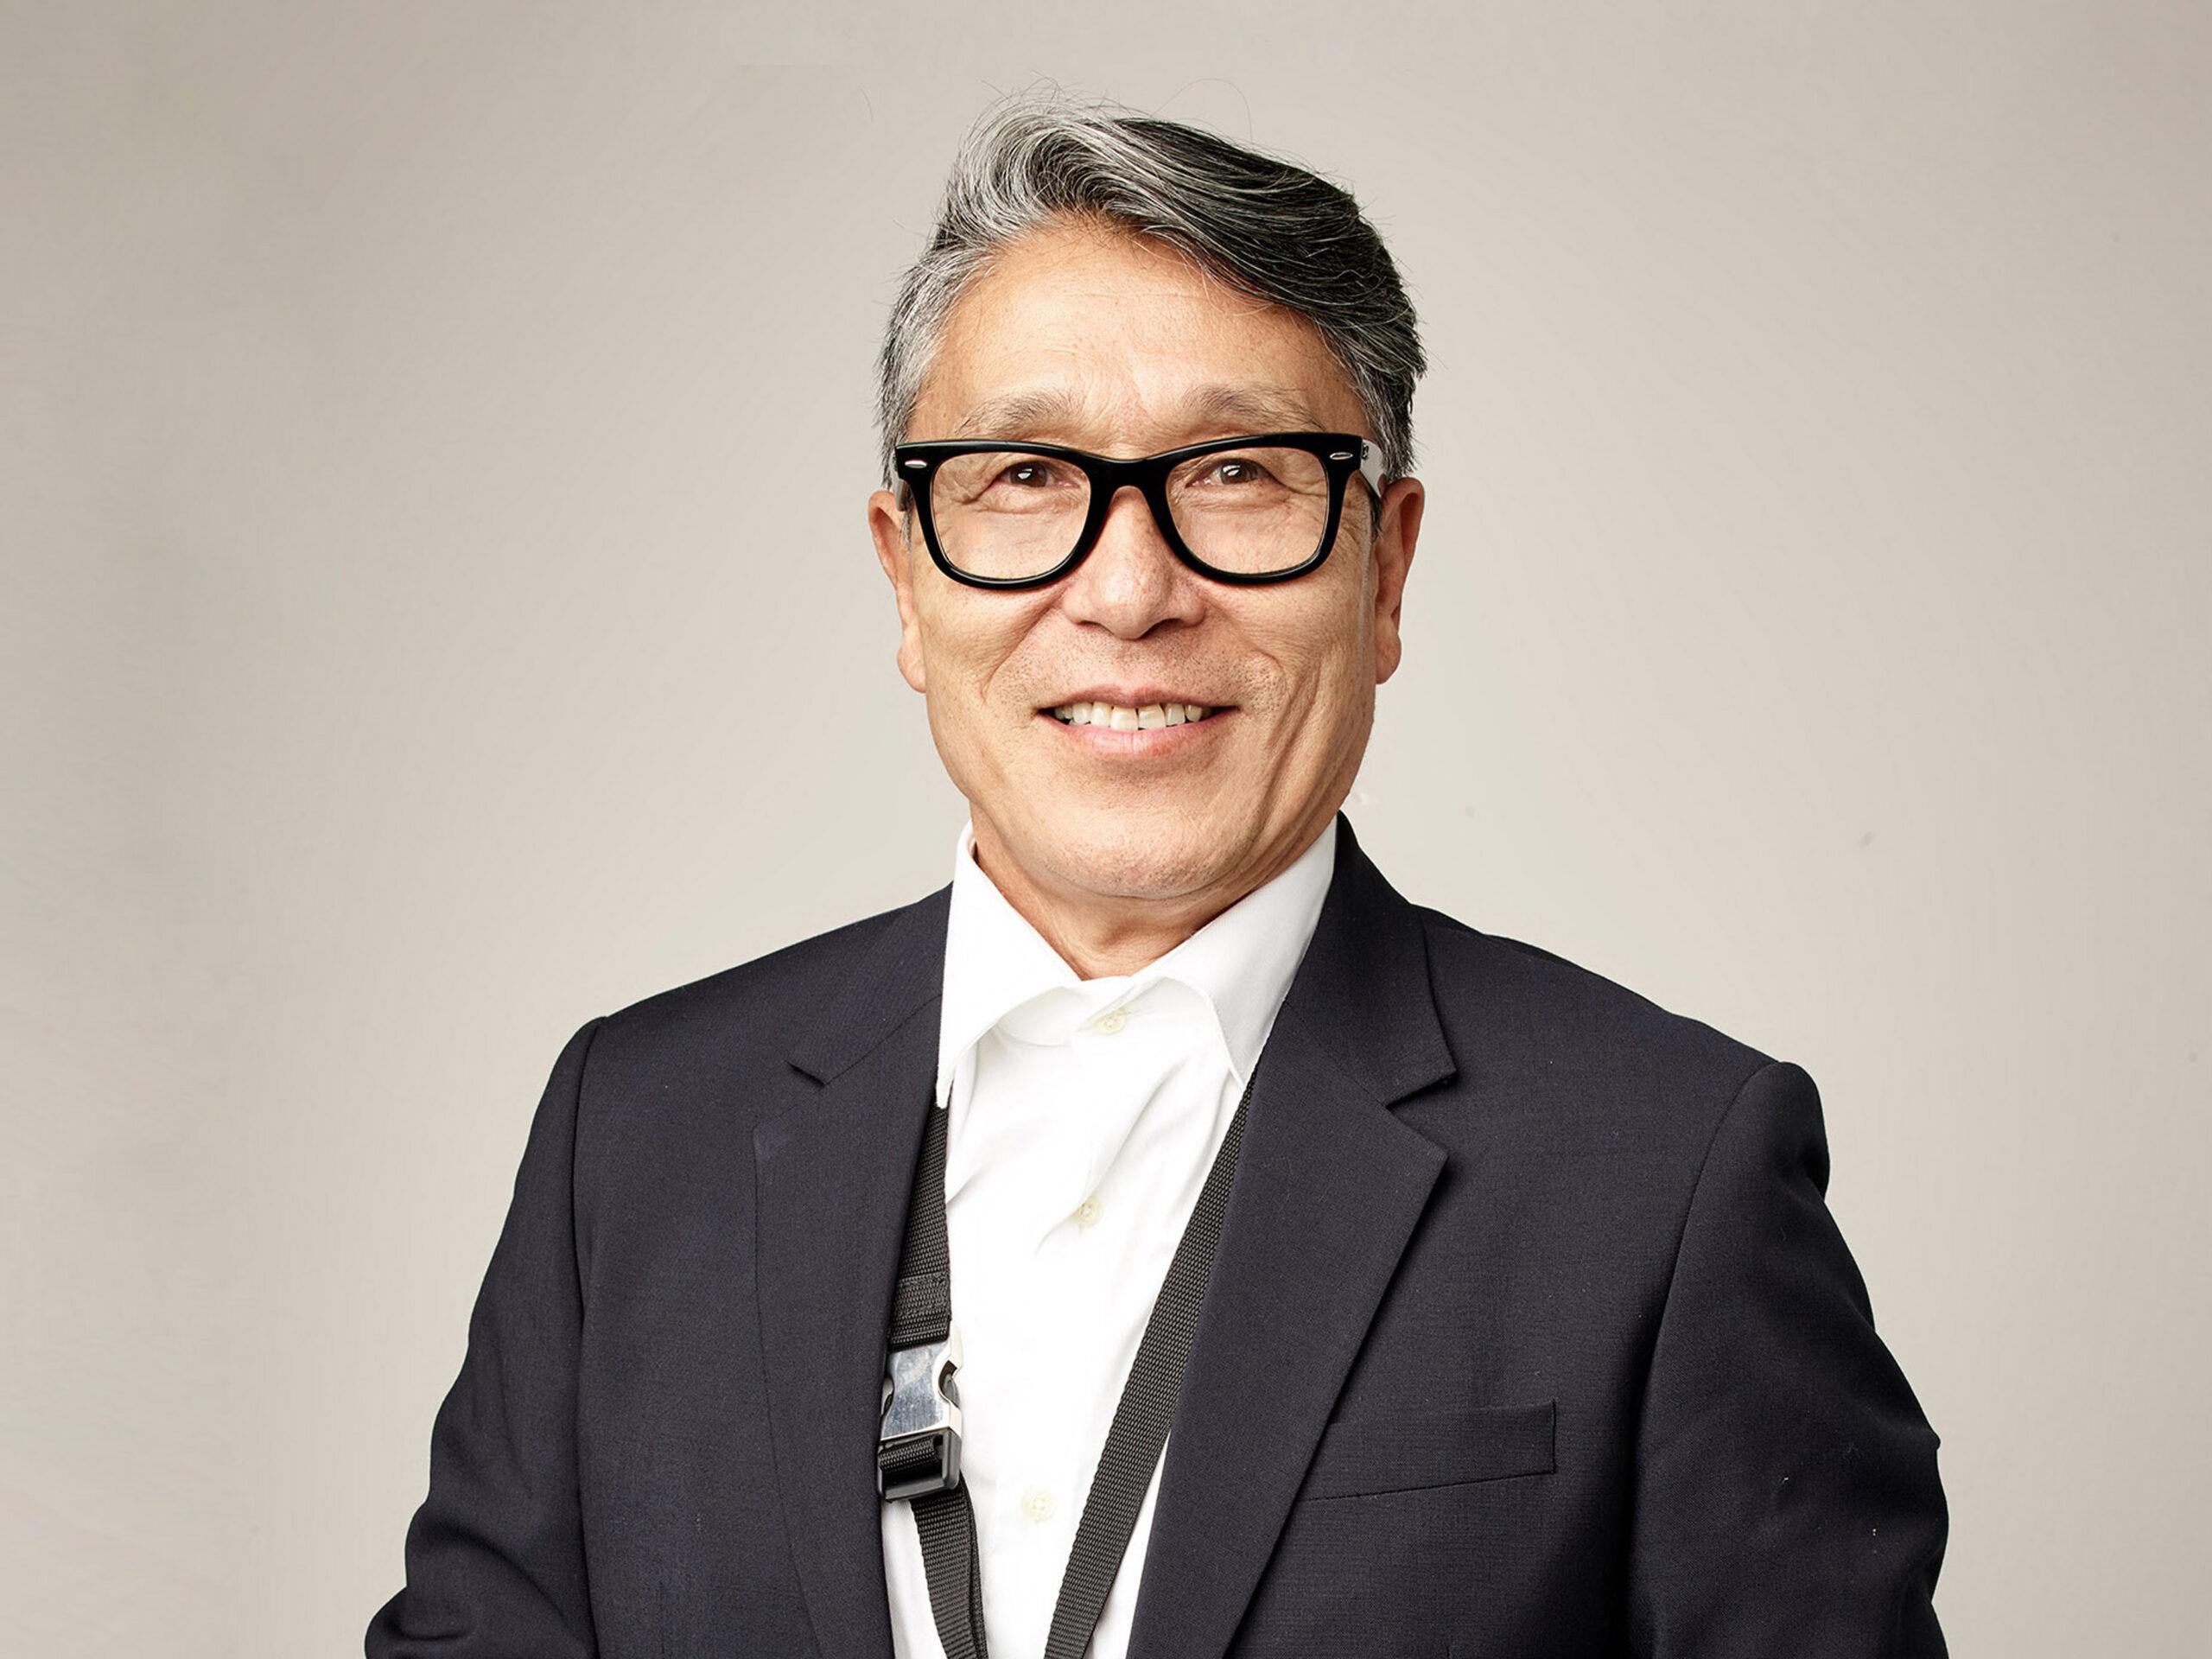 Masazumi Chaya